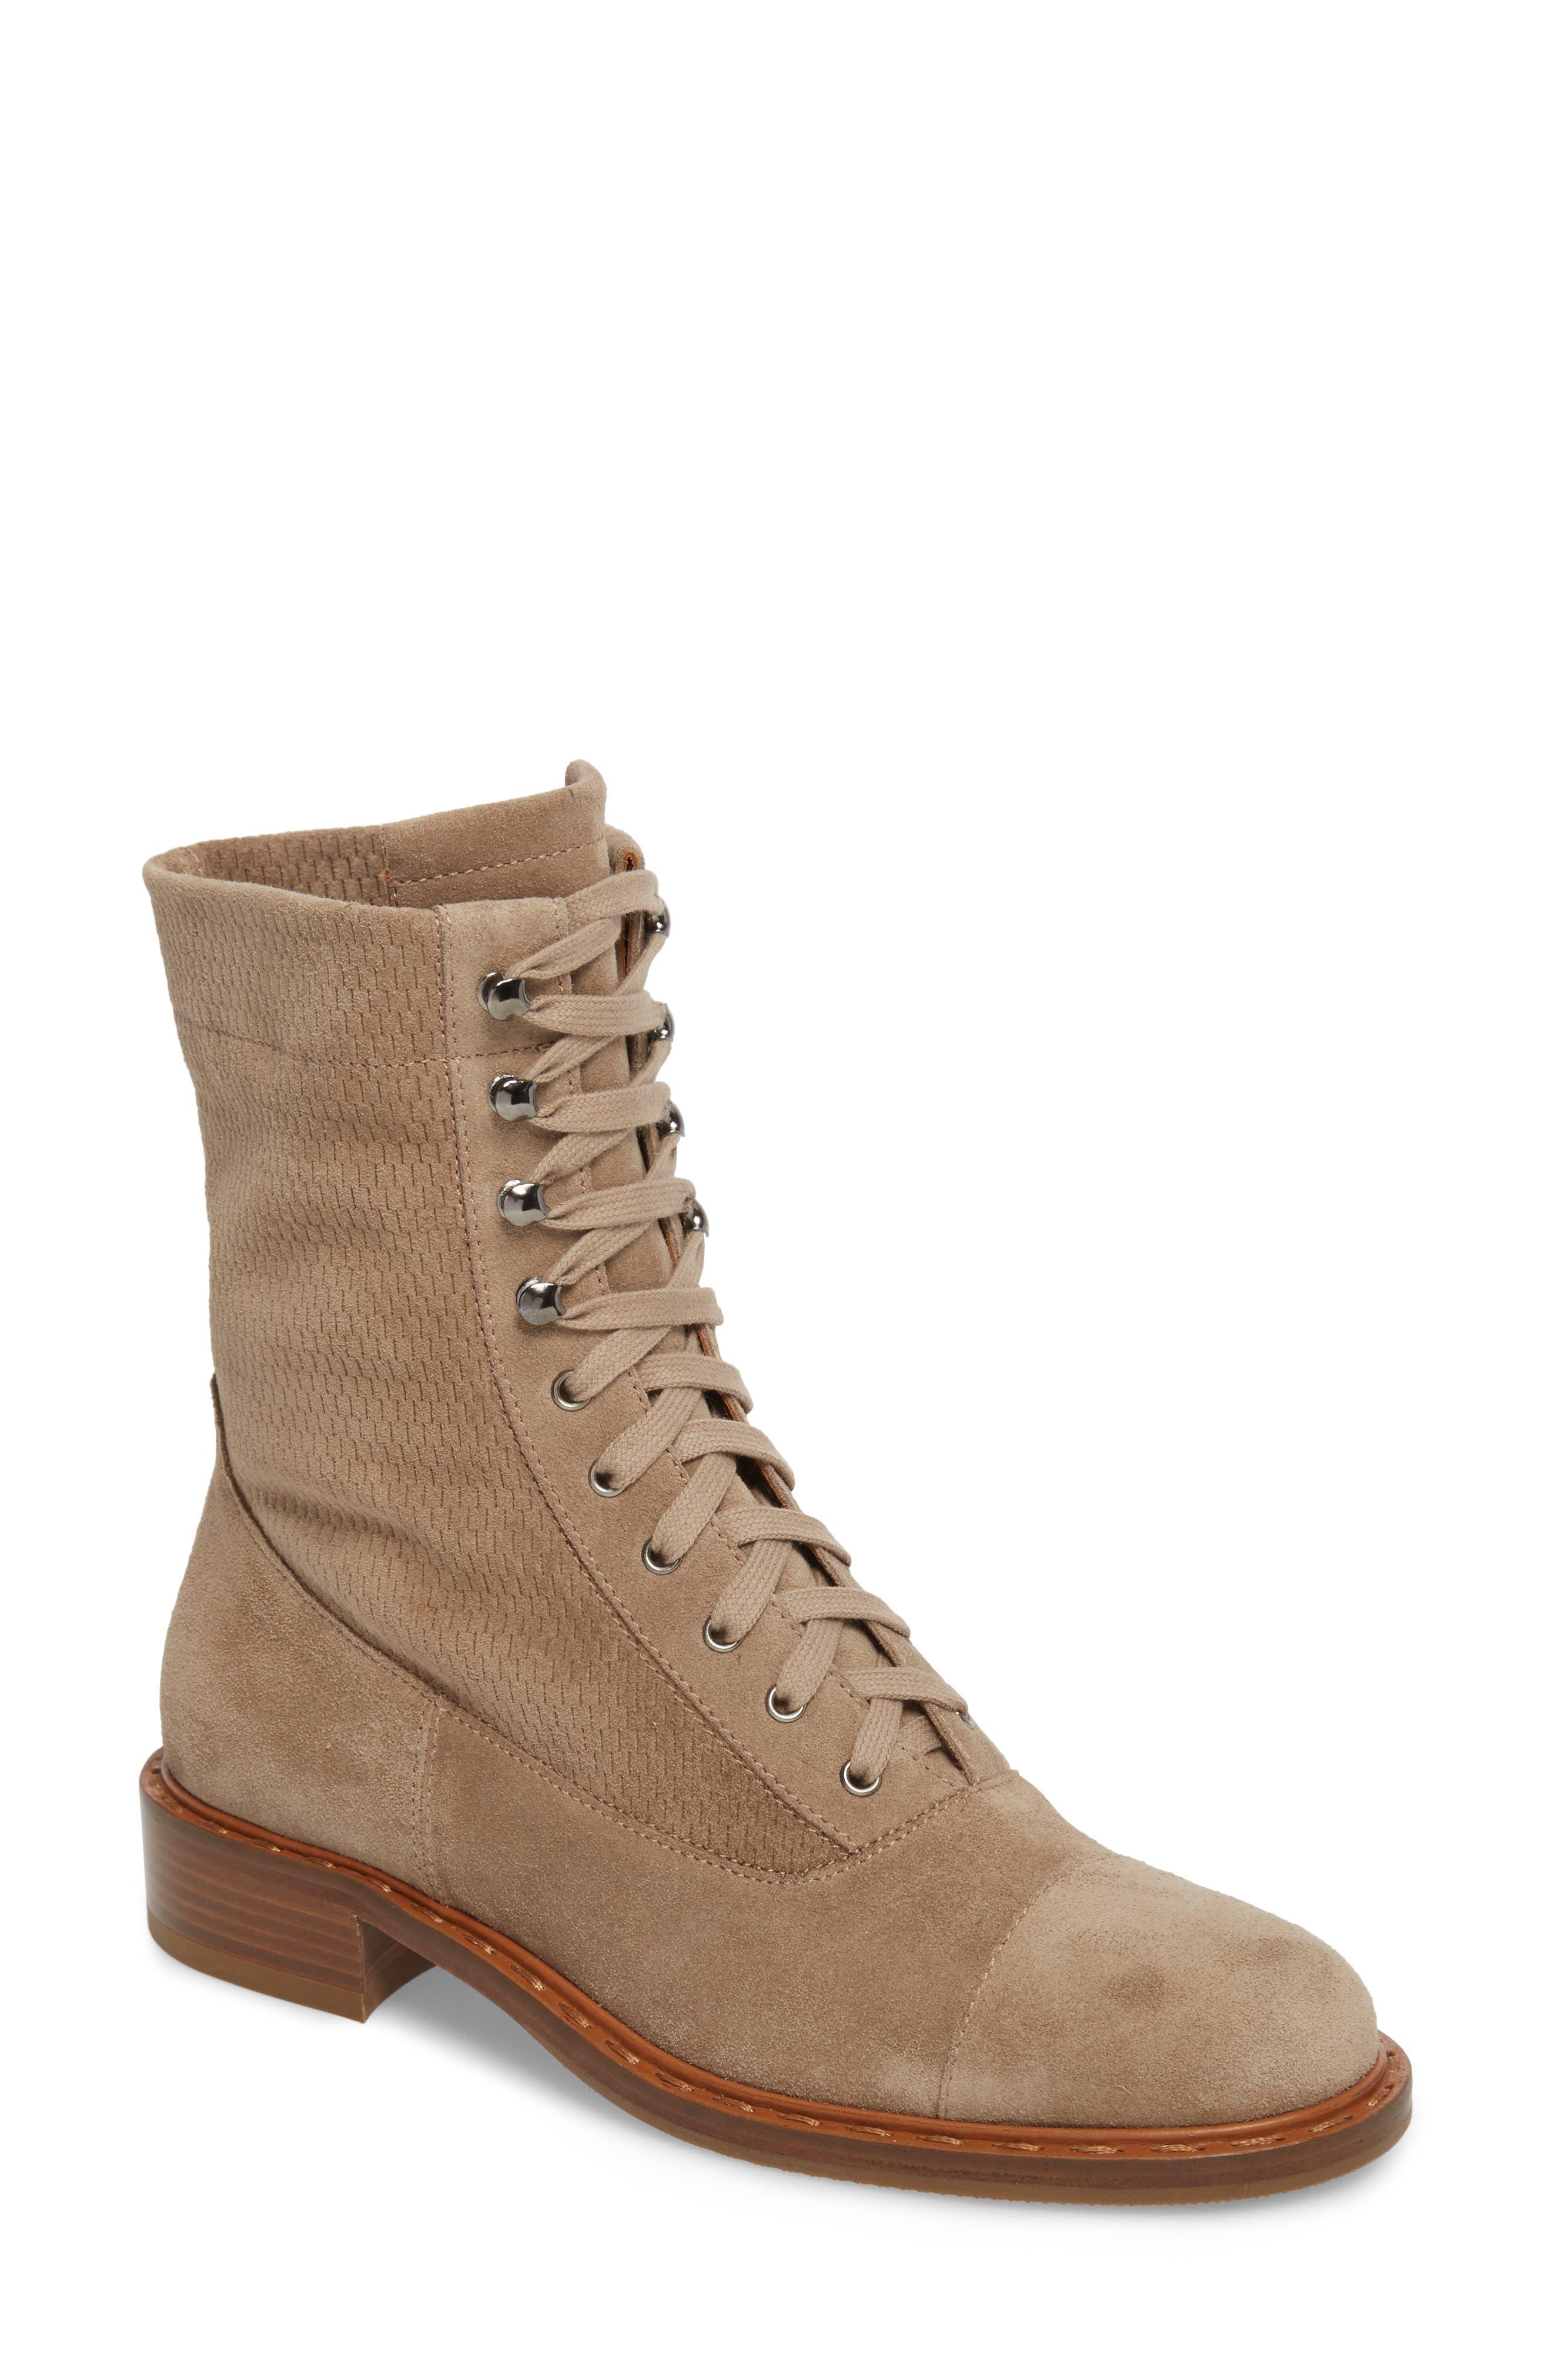 Alternate Image 1 Selected - Aquatalia Brigitta Weatherproof Boot (Women)